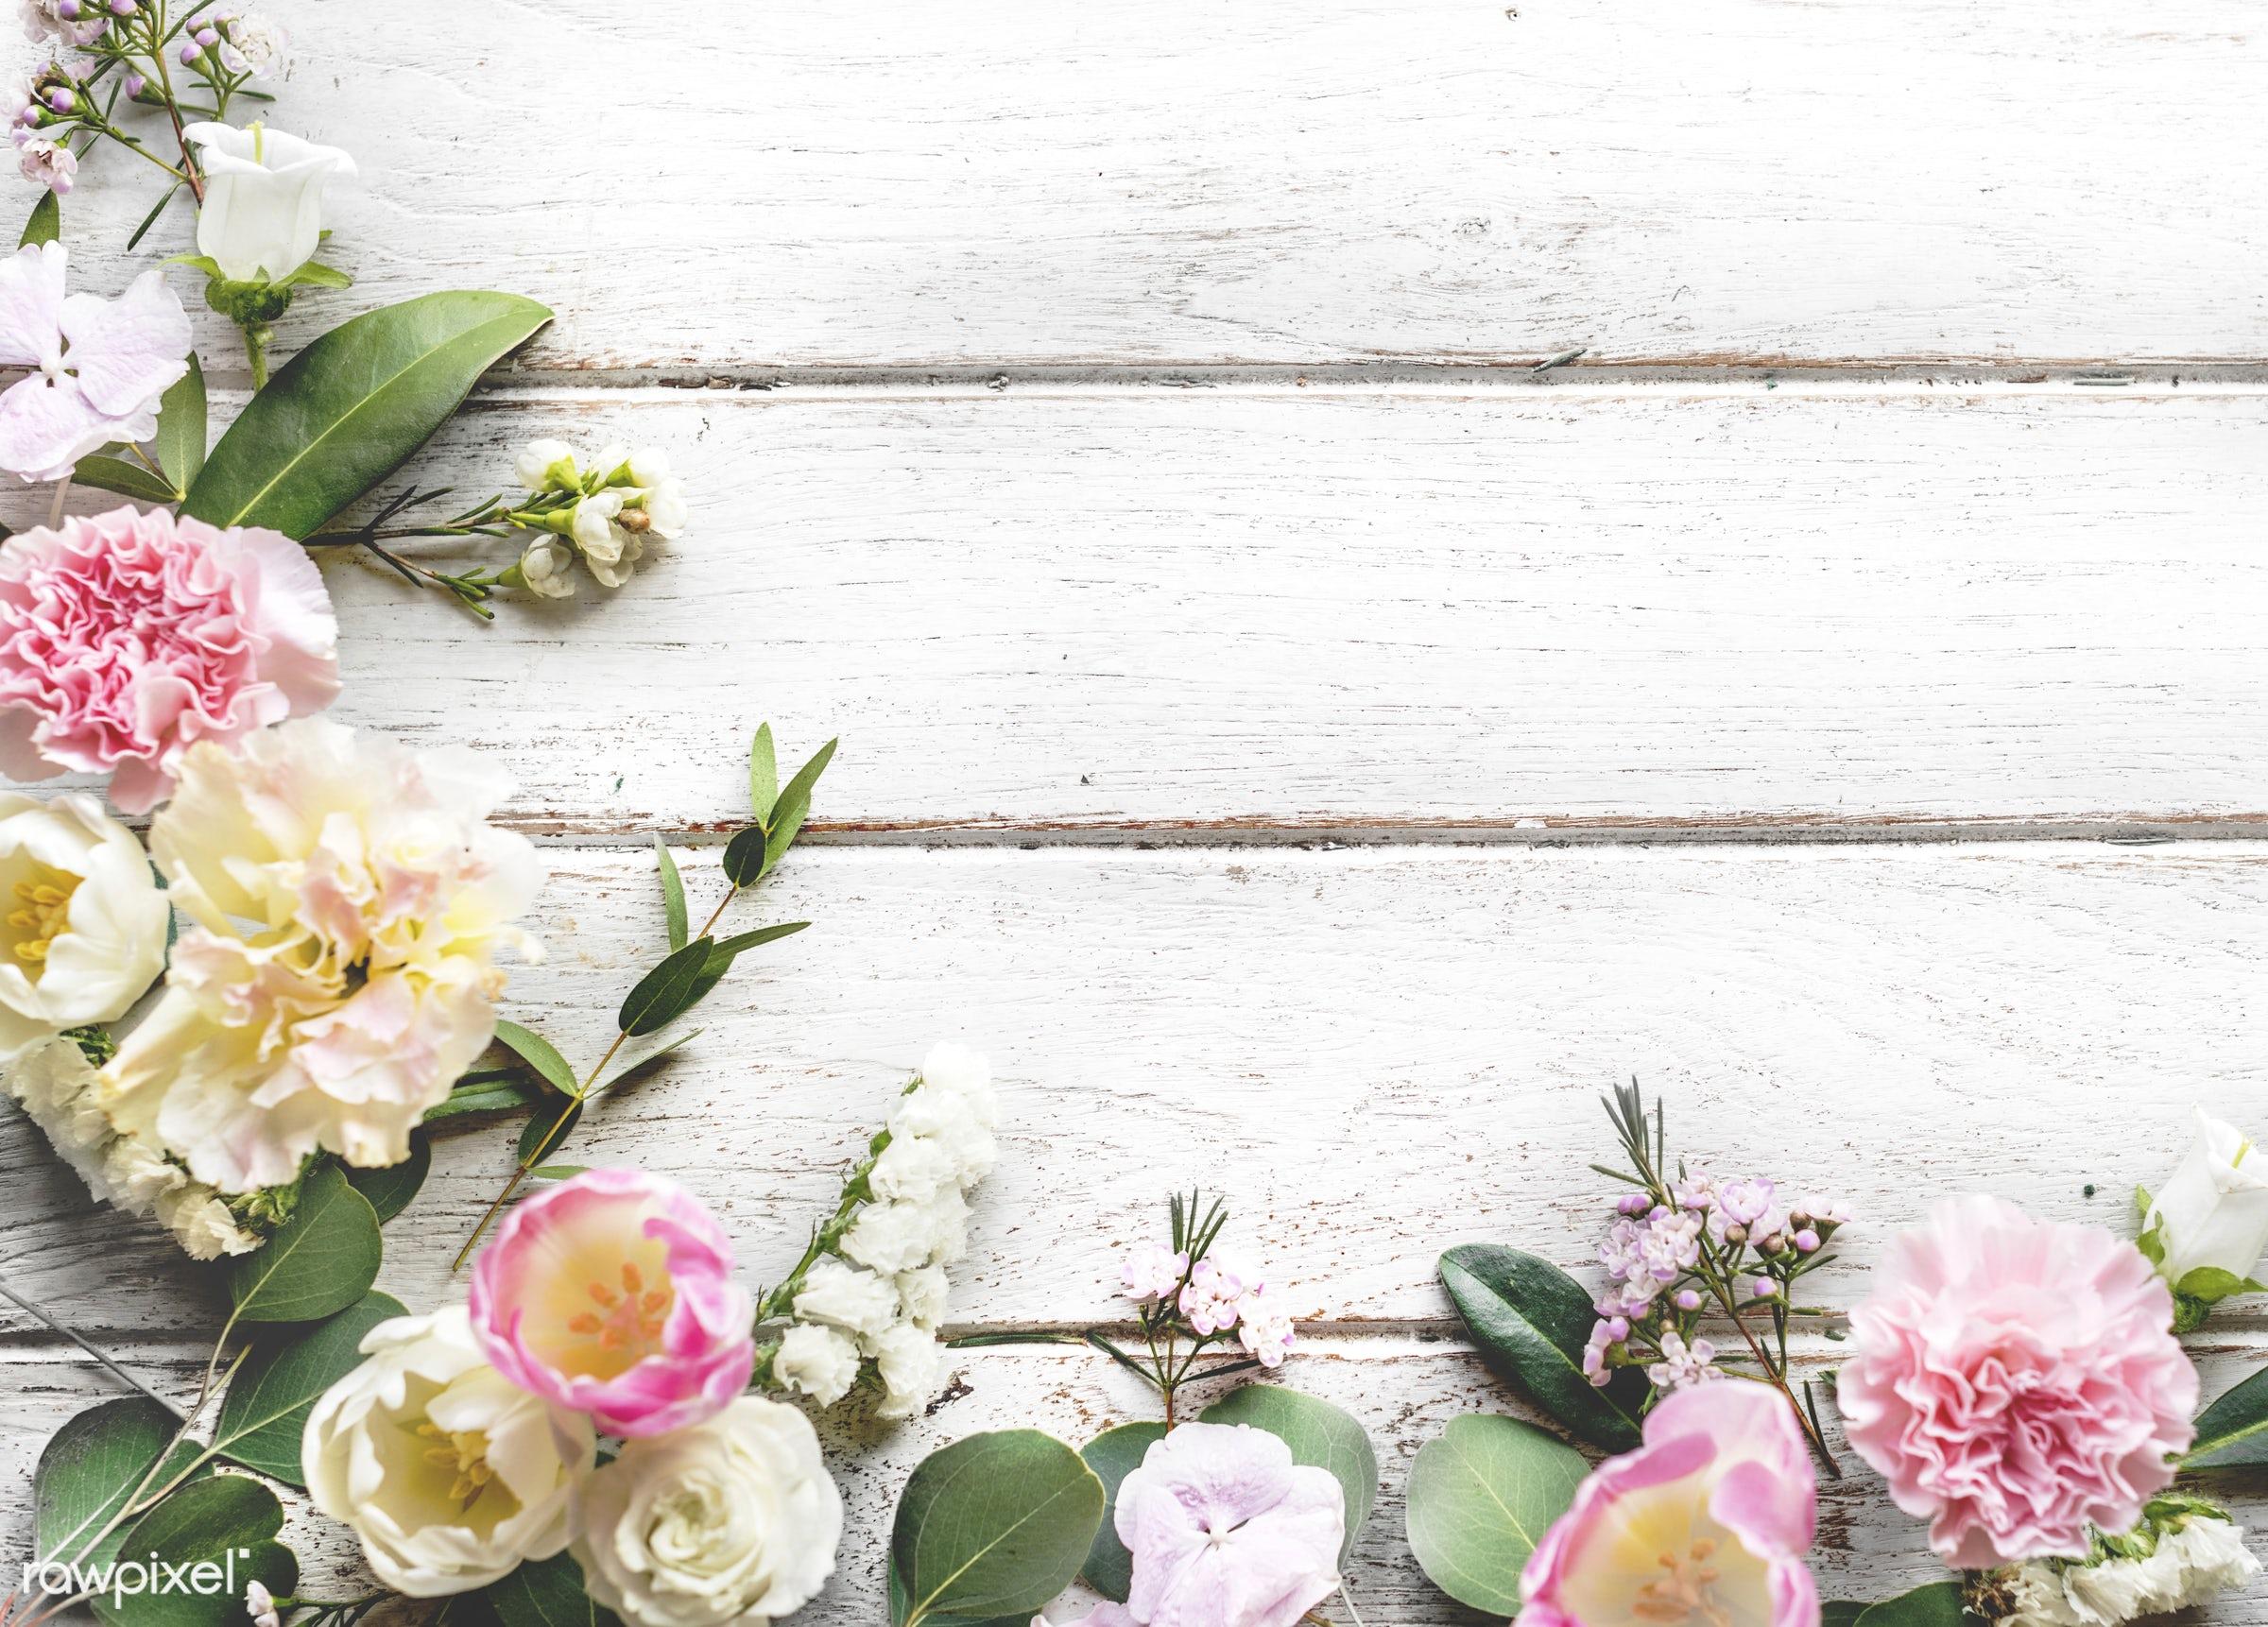 Design space with floral border - blank, border, copy space, decoration, design, design space, feminine, floral, flower,...